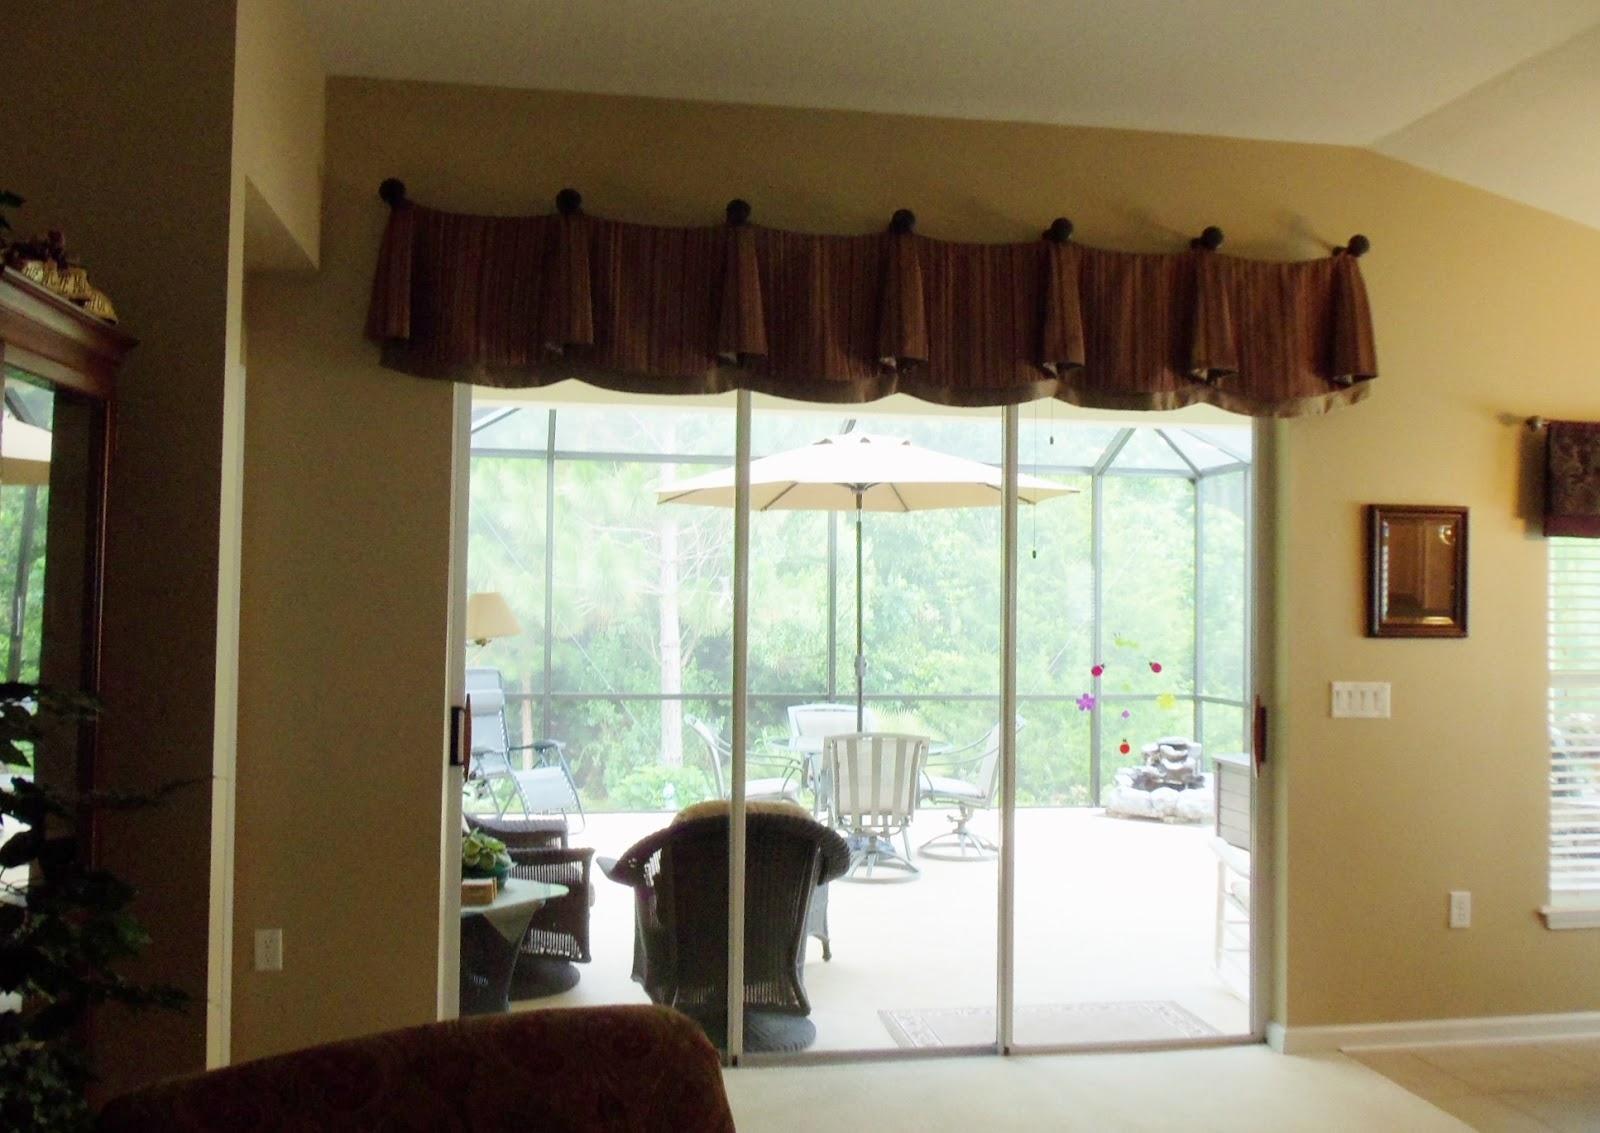 Valance Curtains For Sliding Glass Doorsliding glass door window treatments latest door stair design